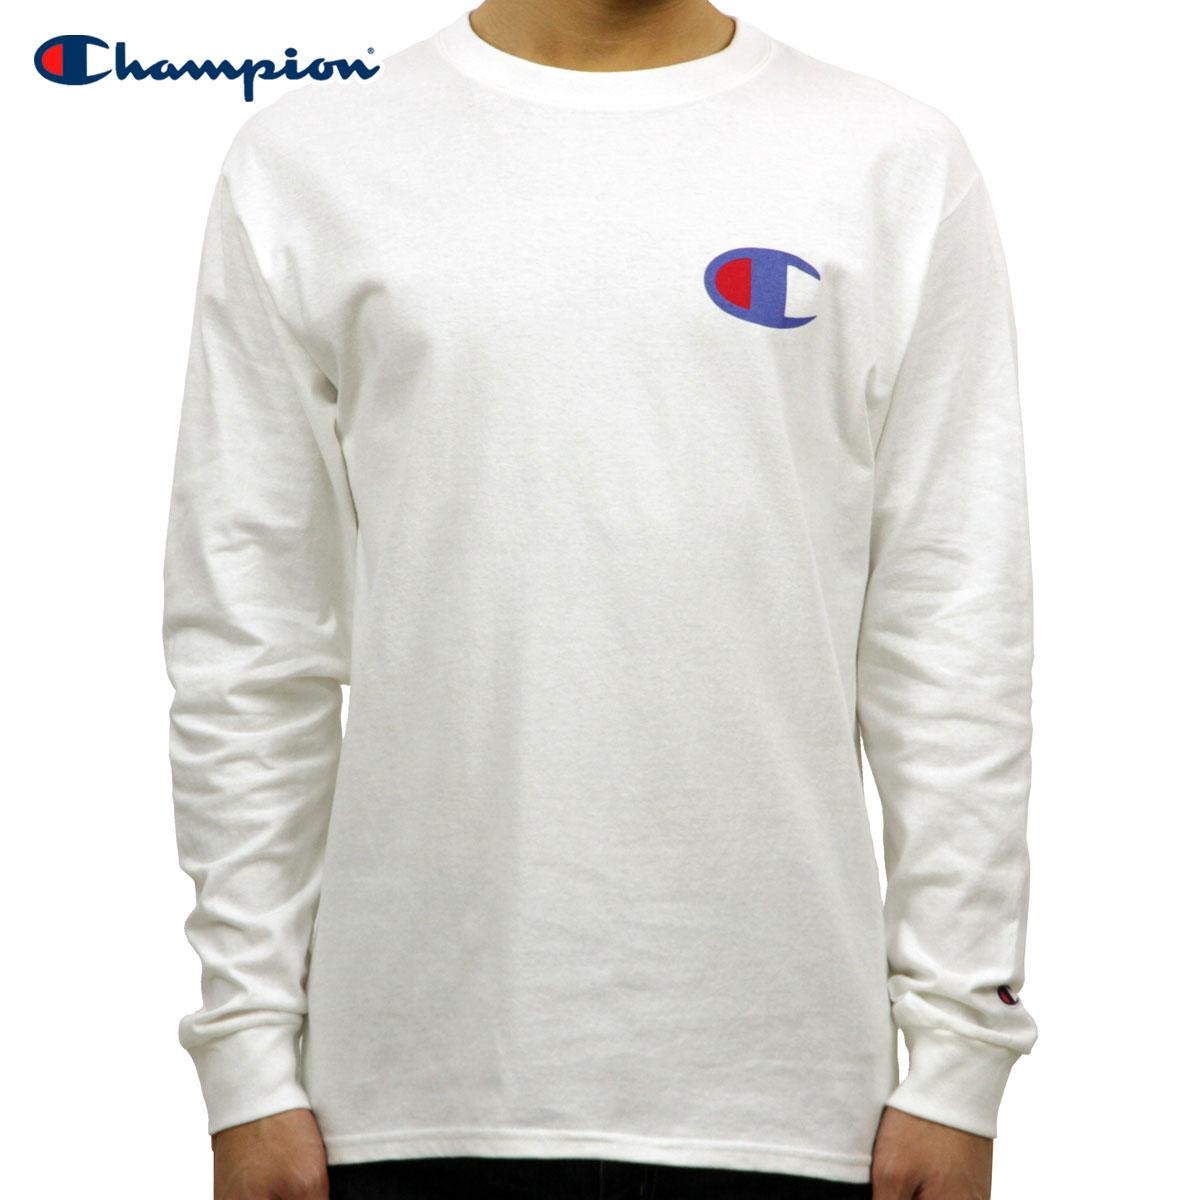 0ff3fd3e4f Champion CHAMPION regular article men long sleeves T-shirt L/S TEE T2229P  Cotton Long Sleeve Tee 045-WHITE #549506 PATRIOTIC C LS D00S20